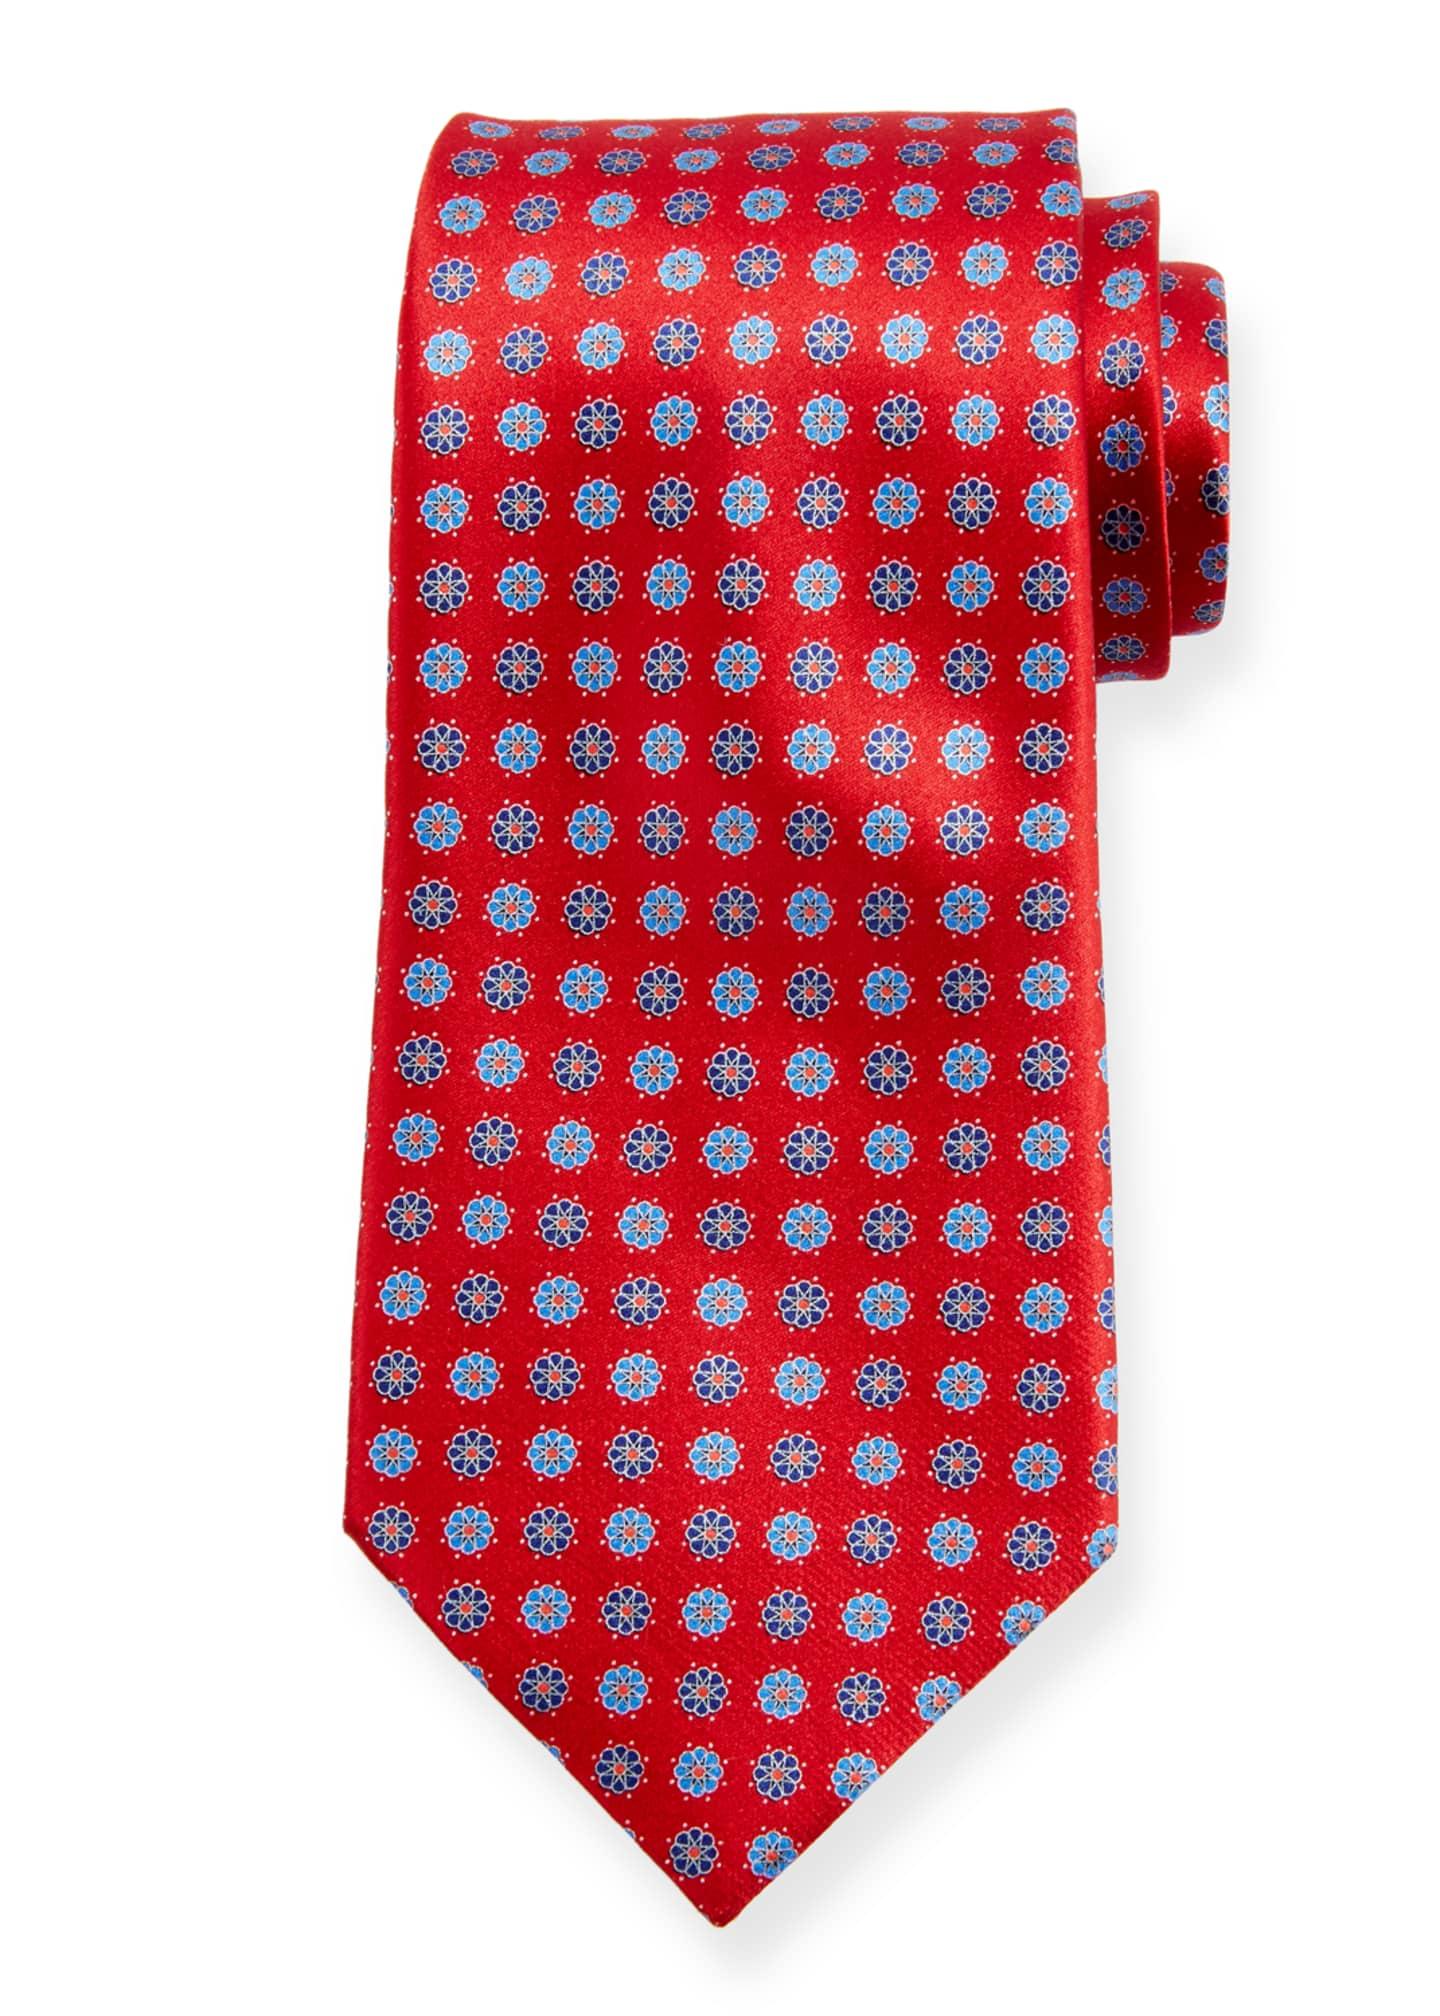 Ermenegildo Zegna Alternating Flowers Silk Tie, Red